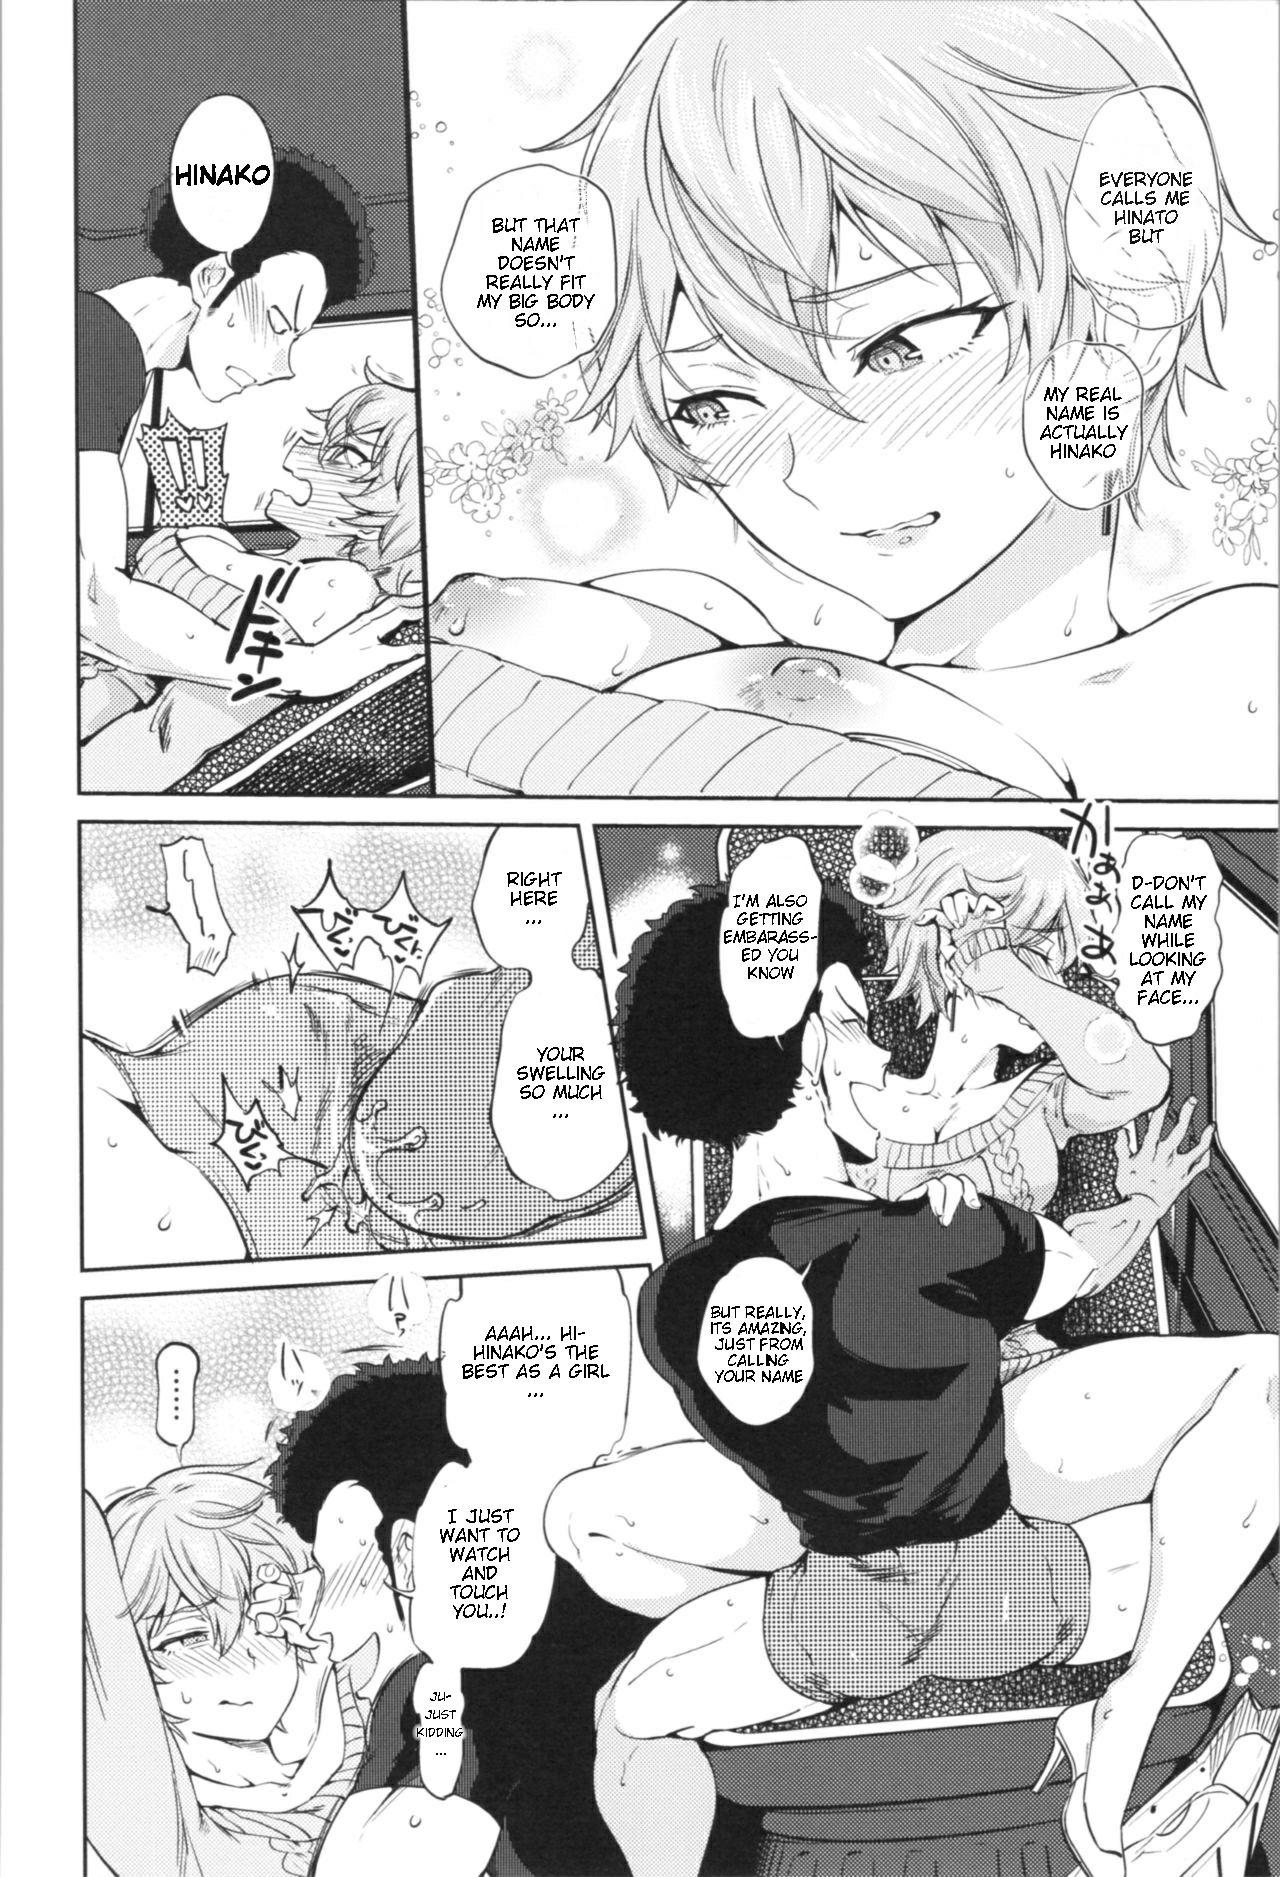 Ouji no Tamago wa Hina ni Kaeru | The Prince's Egg is Hatching 8